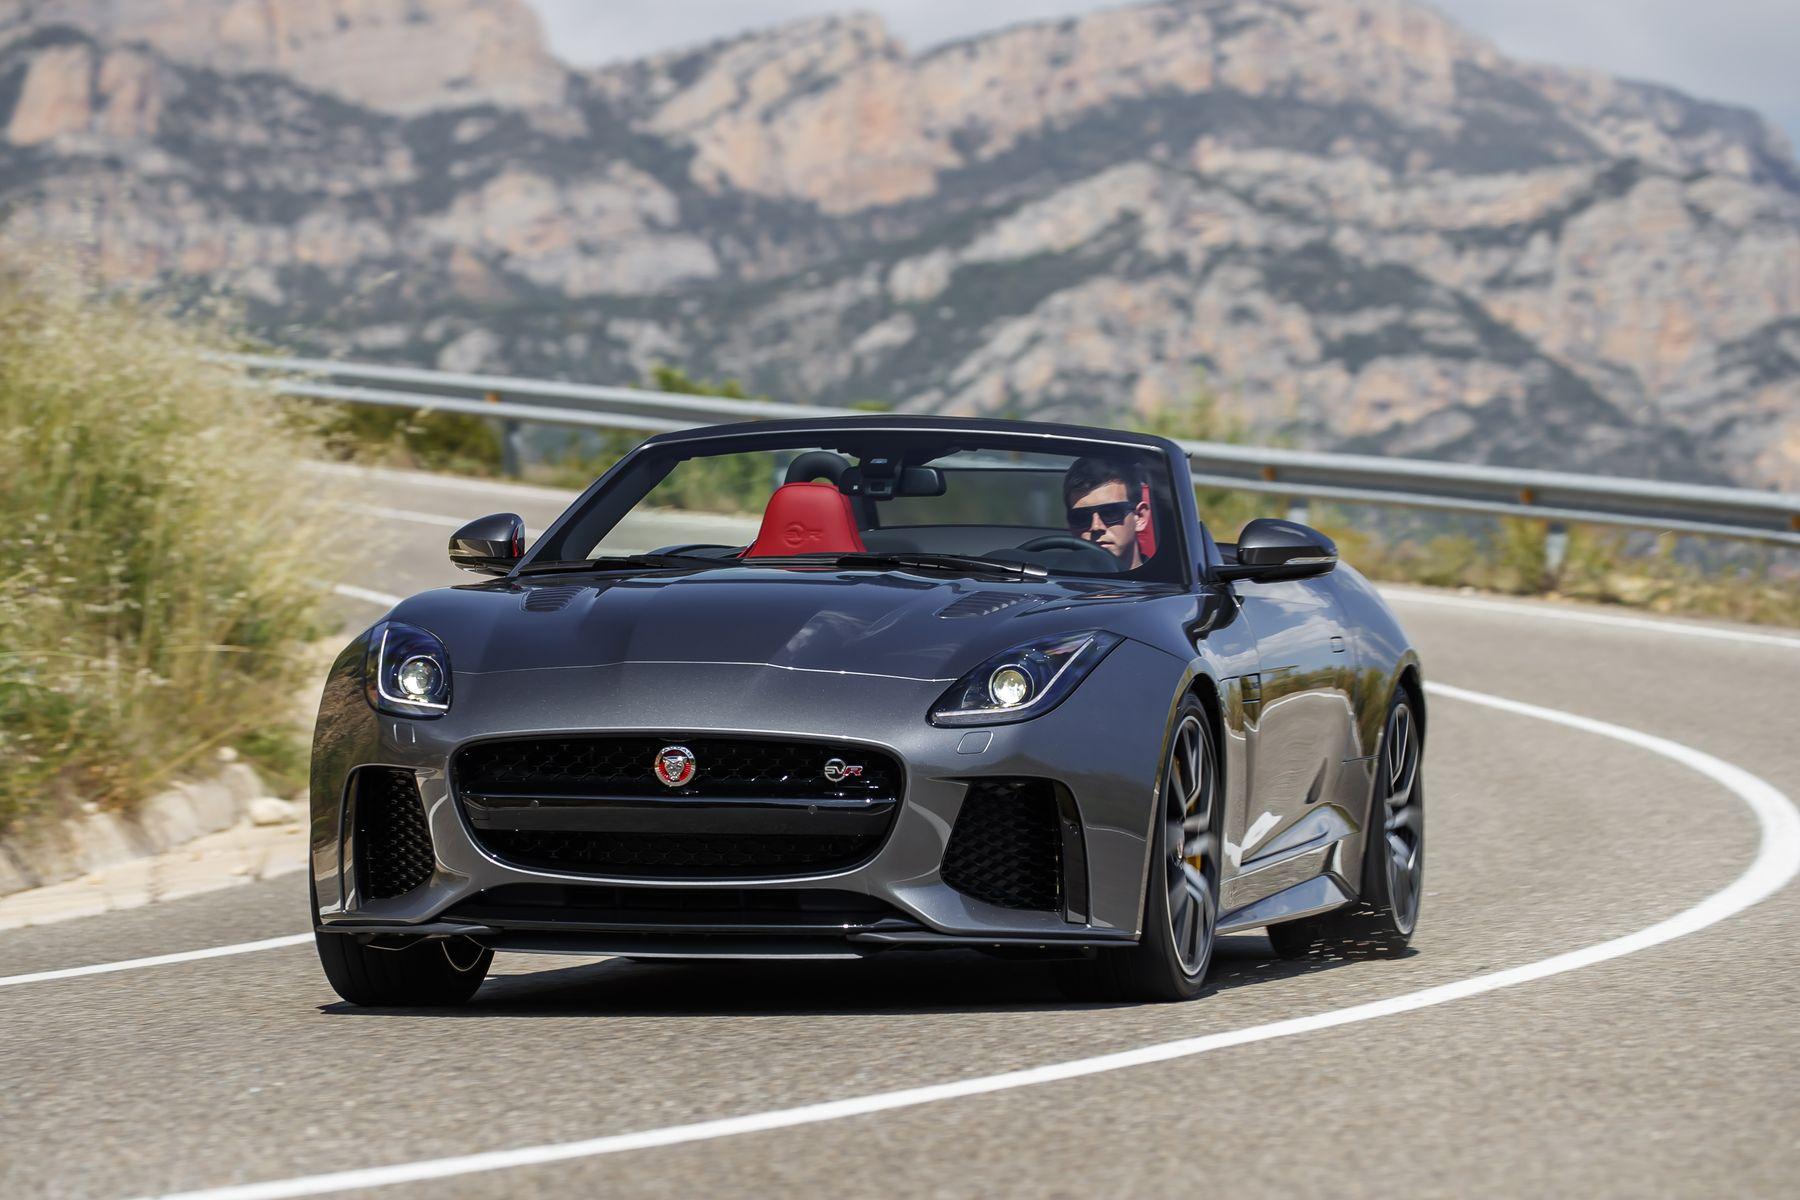 jaguar f type svr cabrio porsche turbo im visier. Black Bedroom Furniture Sets. Home Design Ideas